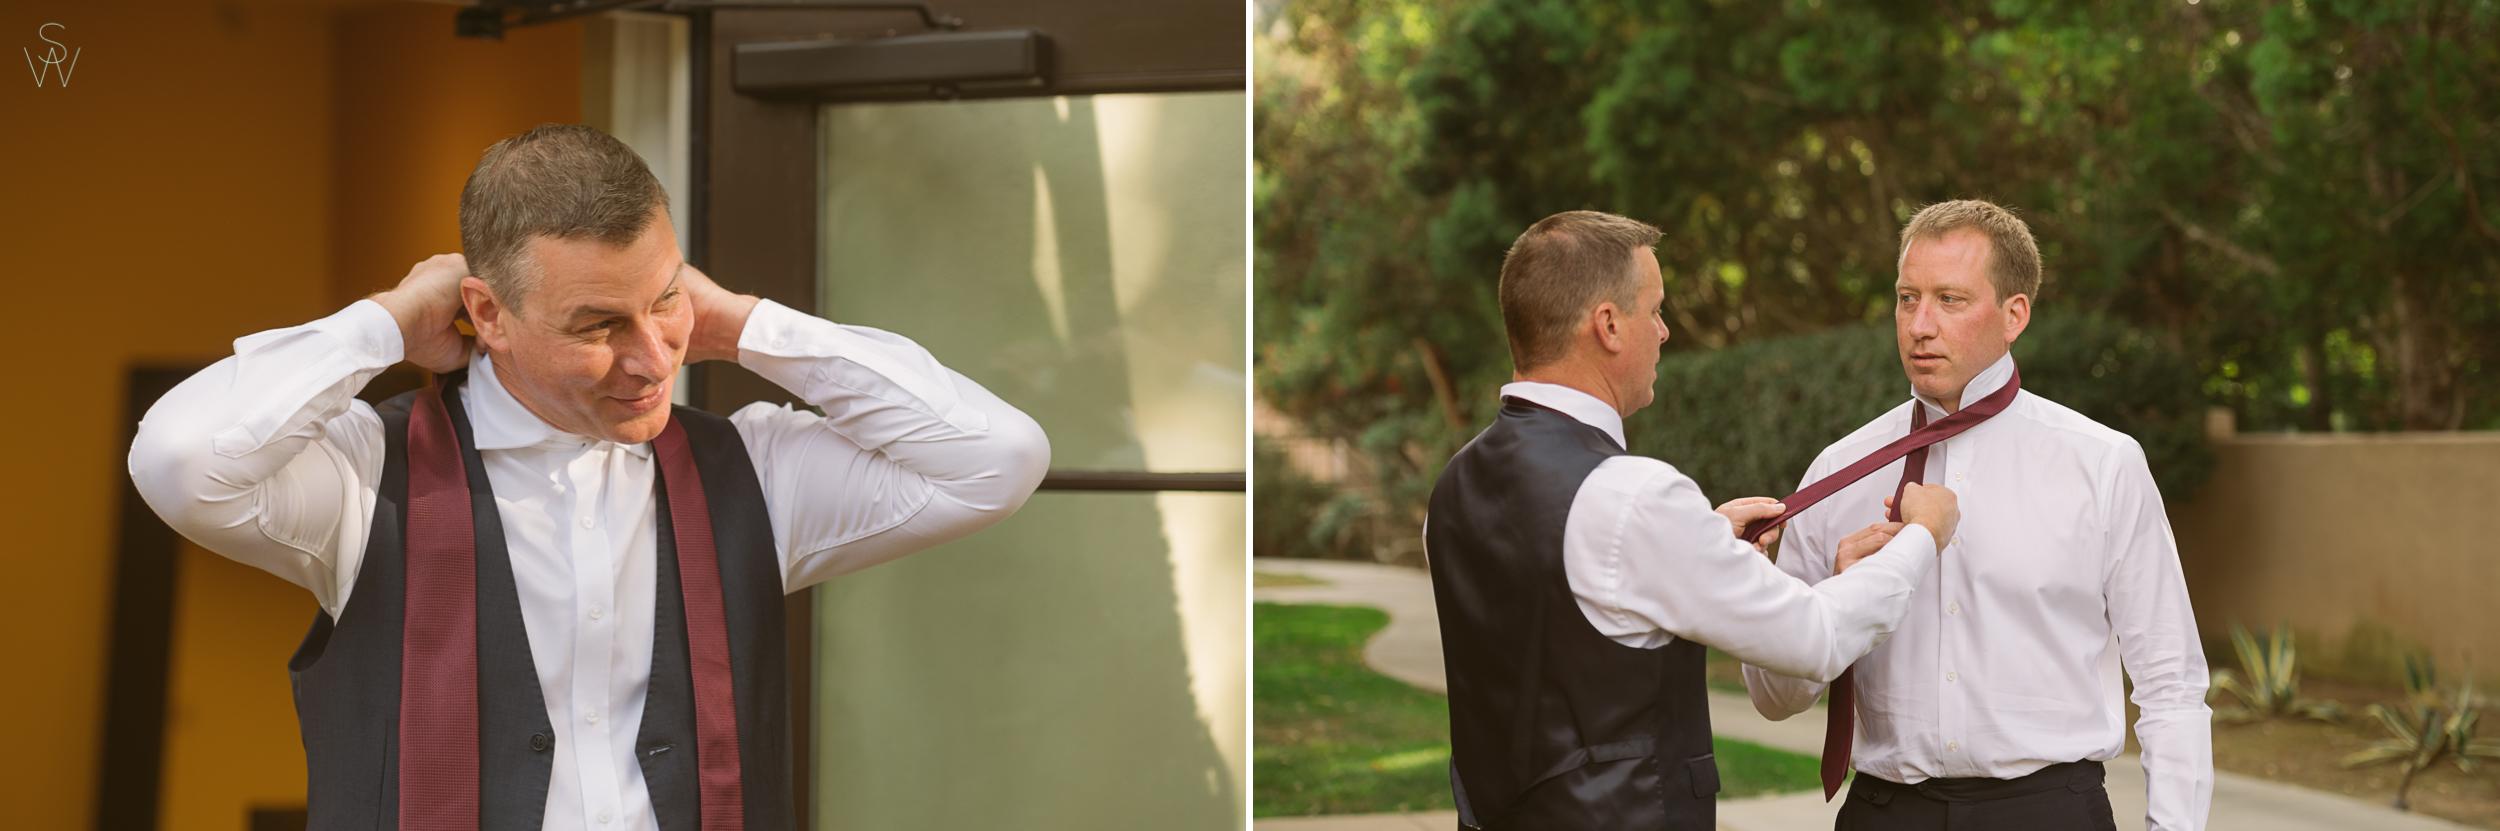 111Estancia.Shewanders.Wedding.Photography.JPG